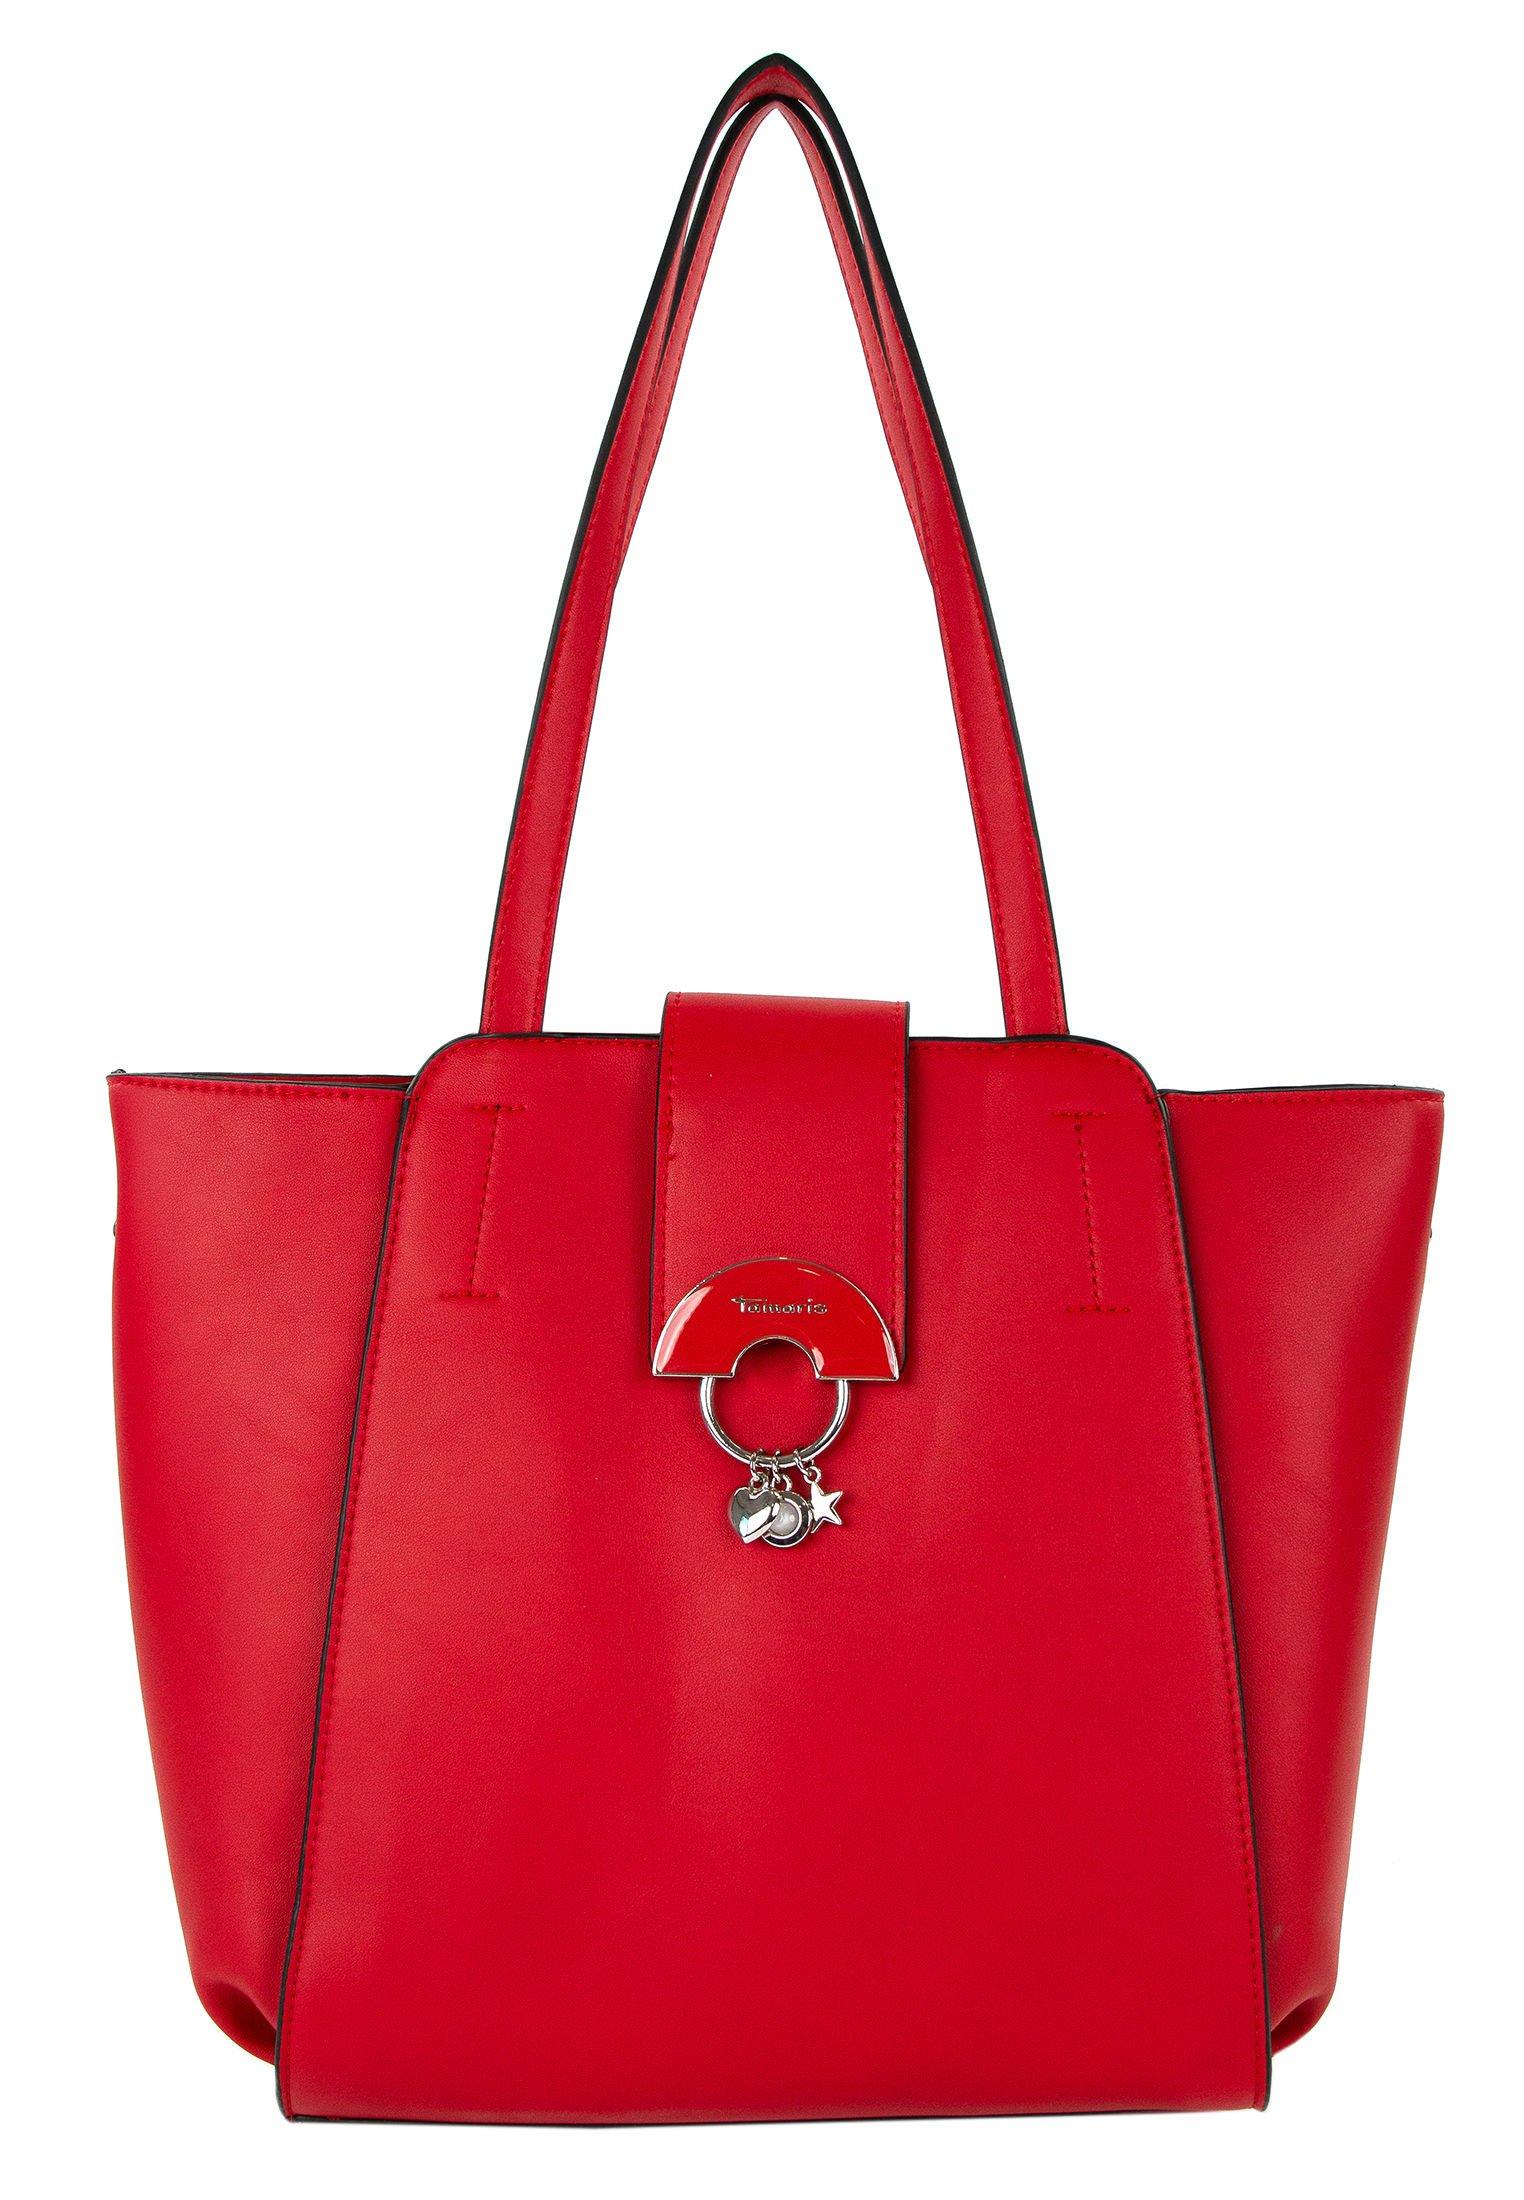 Tamaris Handtasche - Red/rot